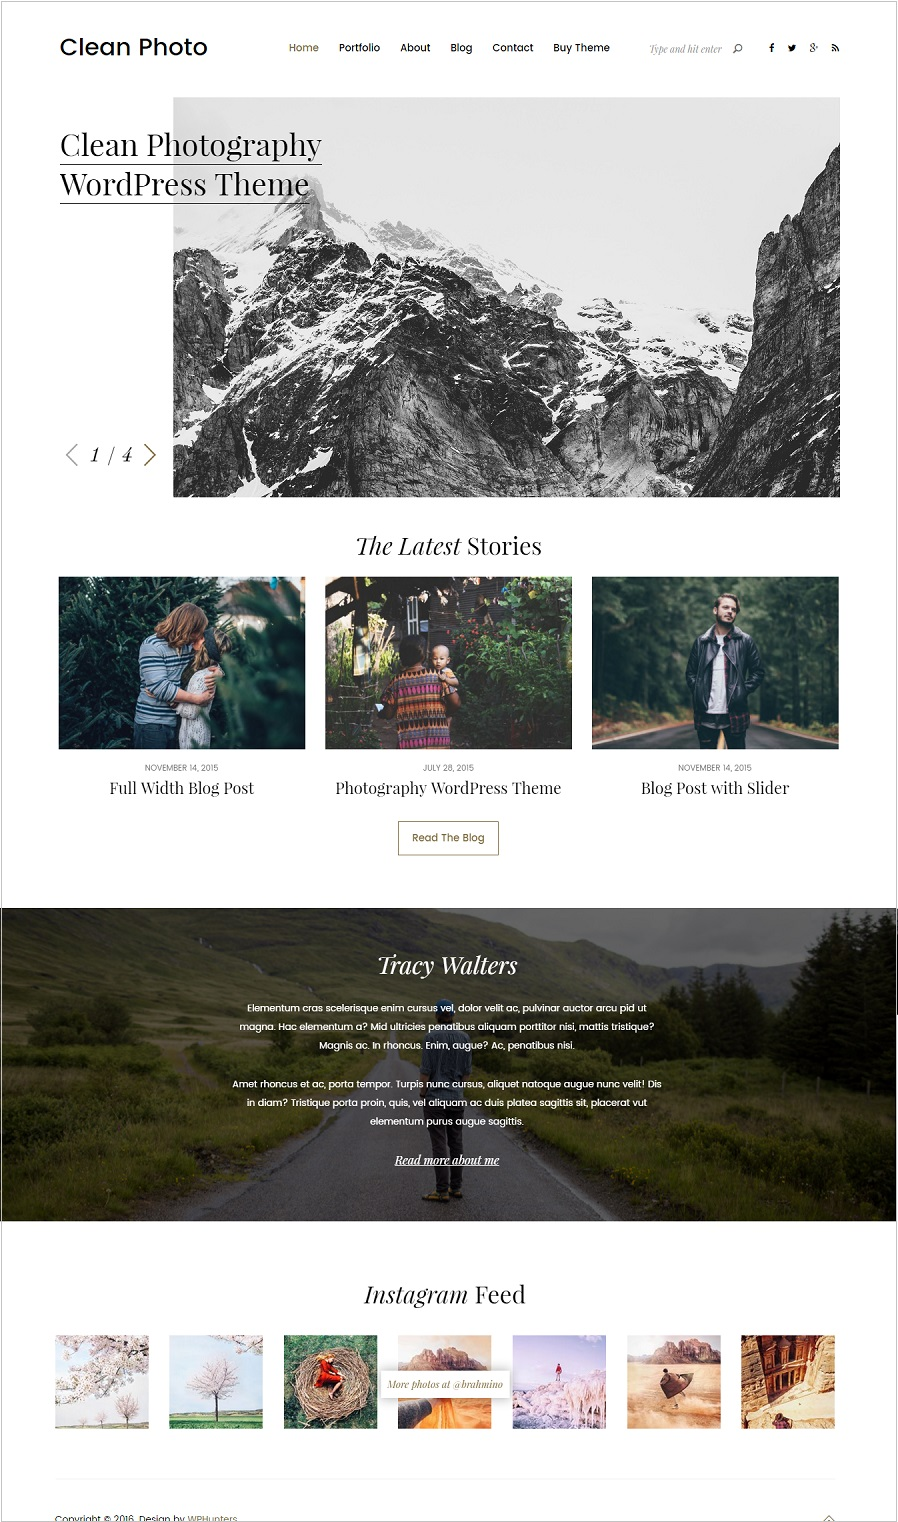 Clean Photo theme is a responsive modern photography WordPress theme